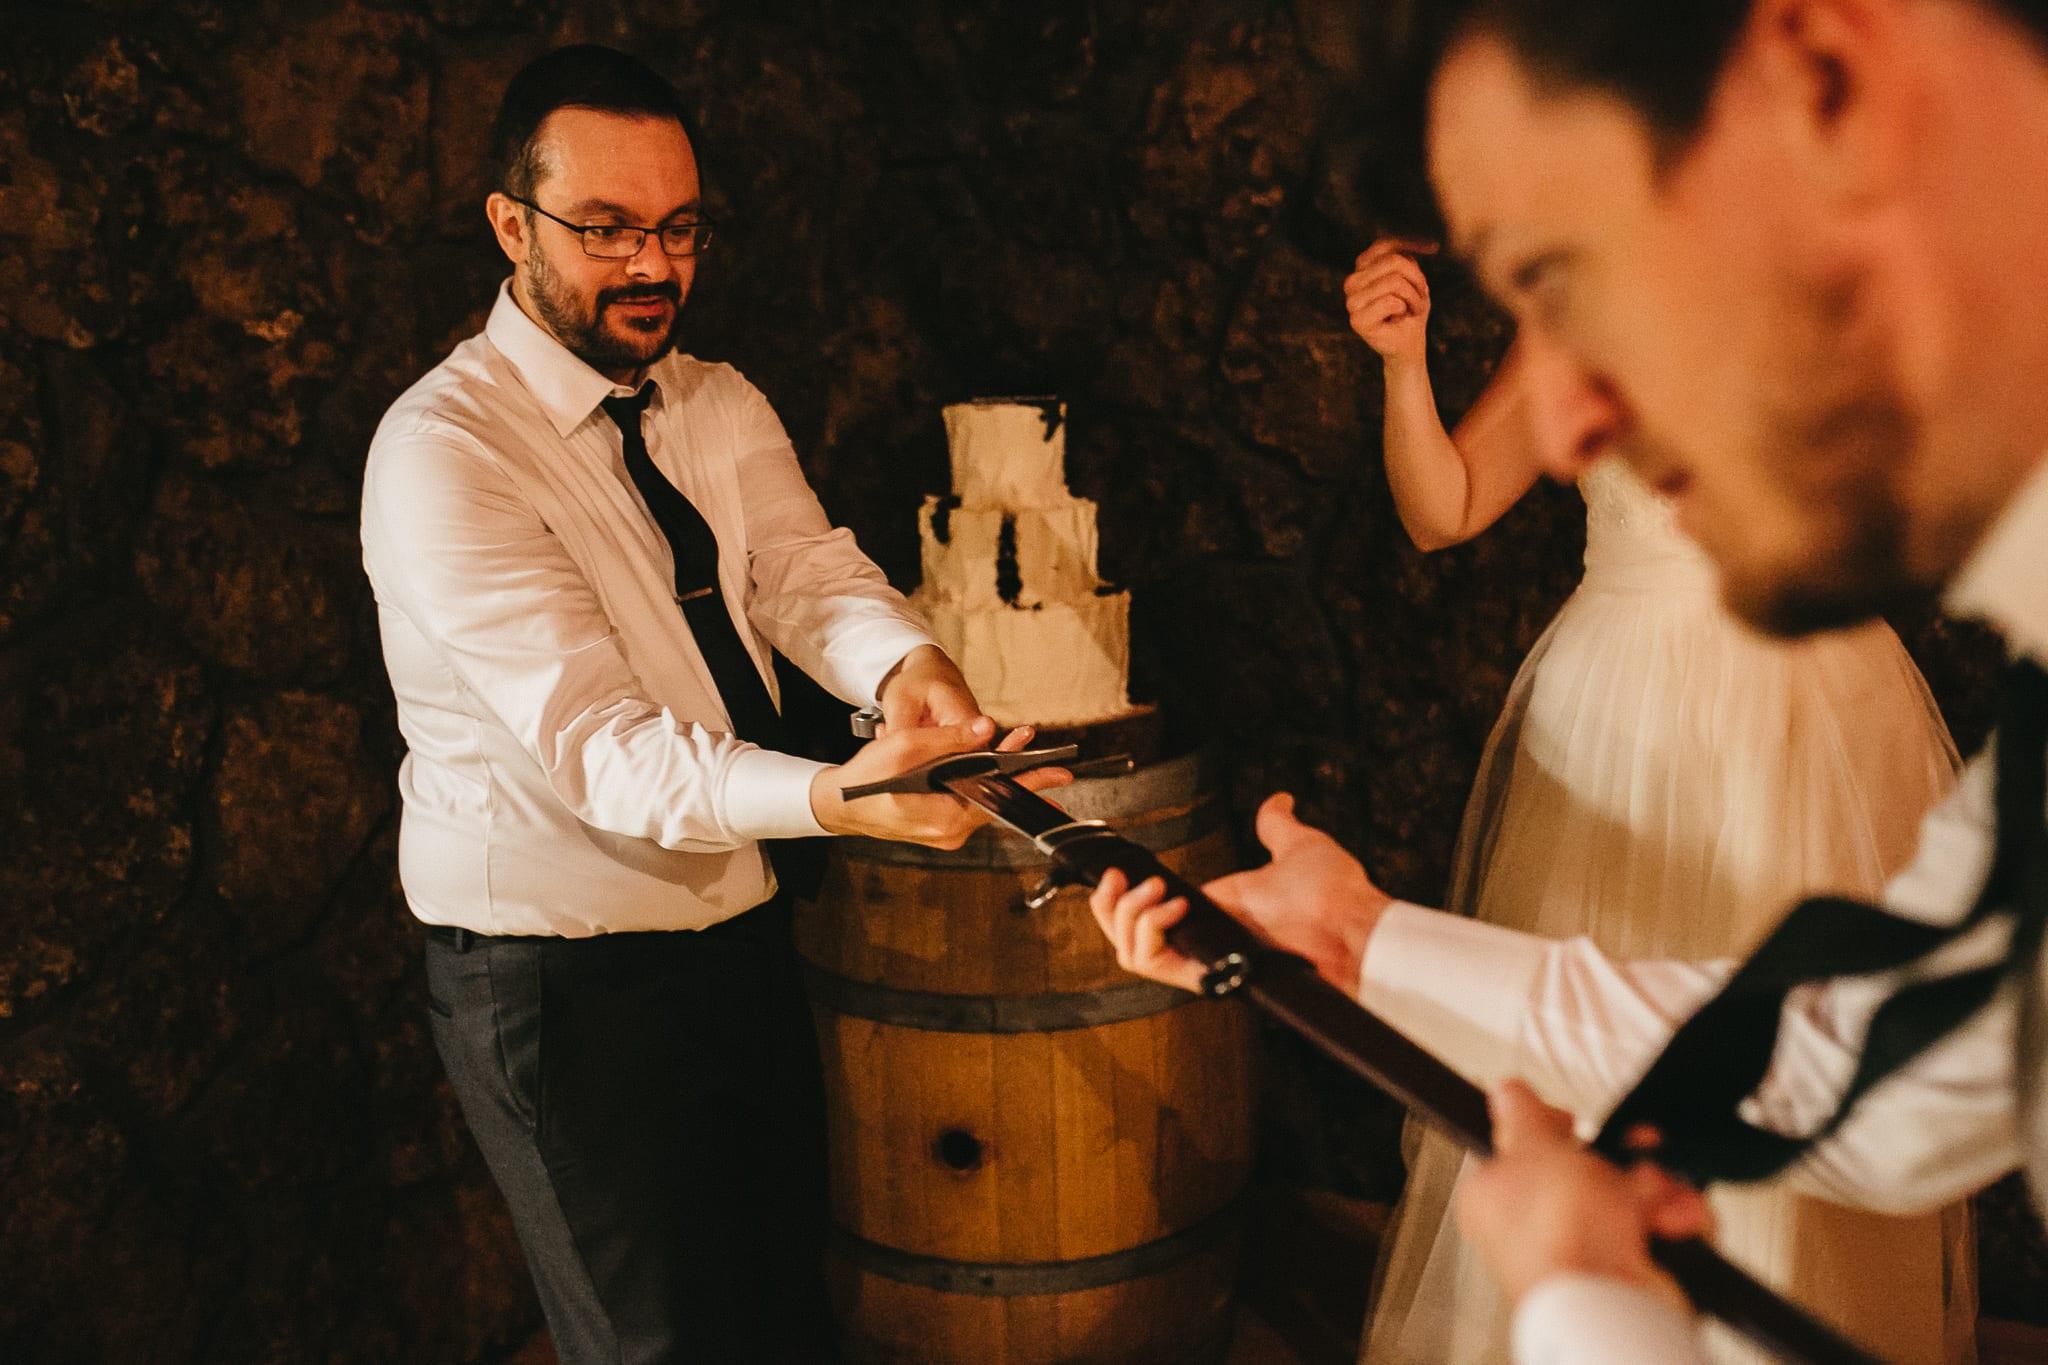 chico-card-center-wedding-photographer-61